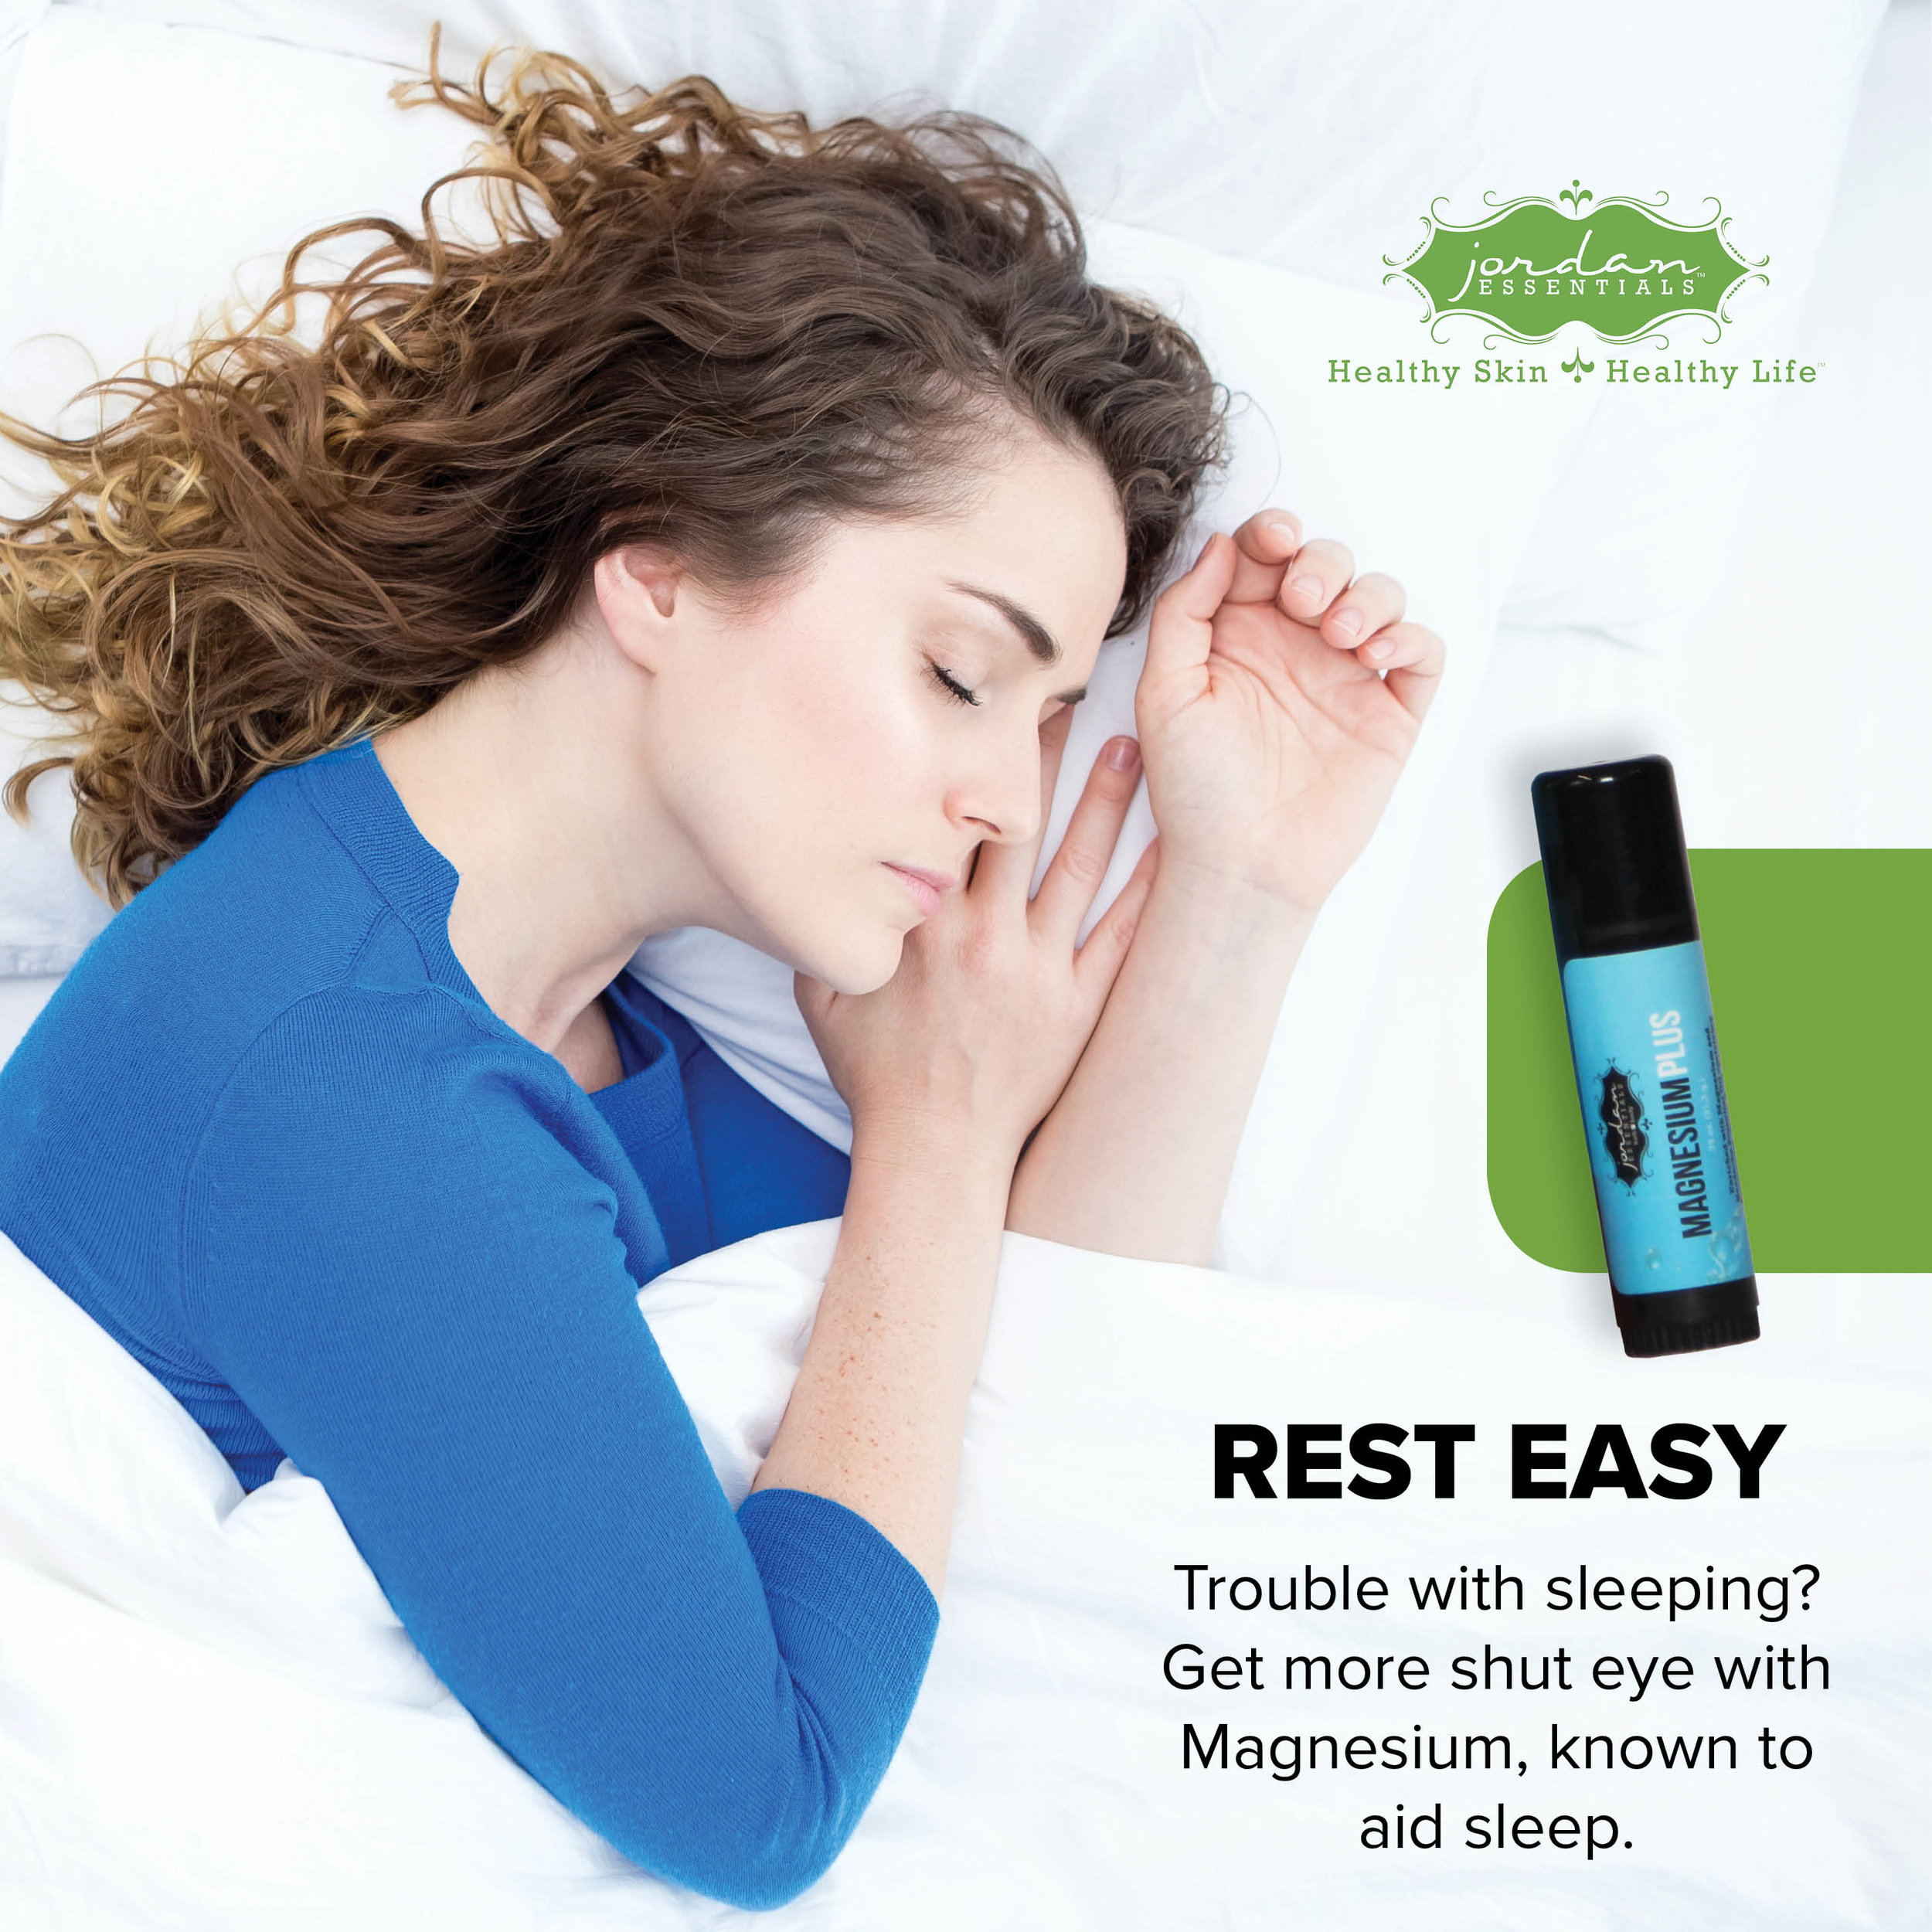 Magnesium Rest Easy.jpg